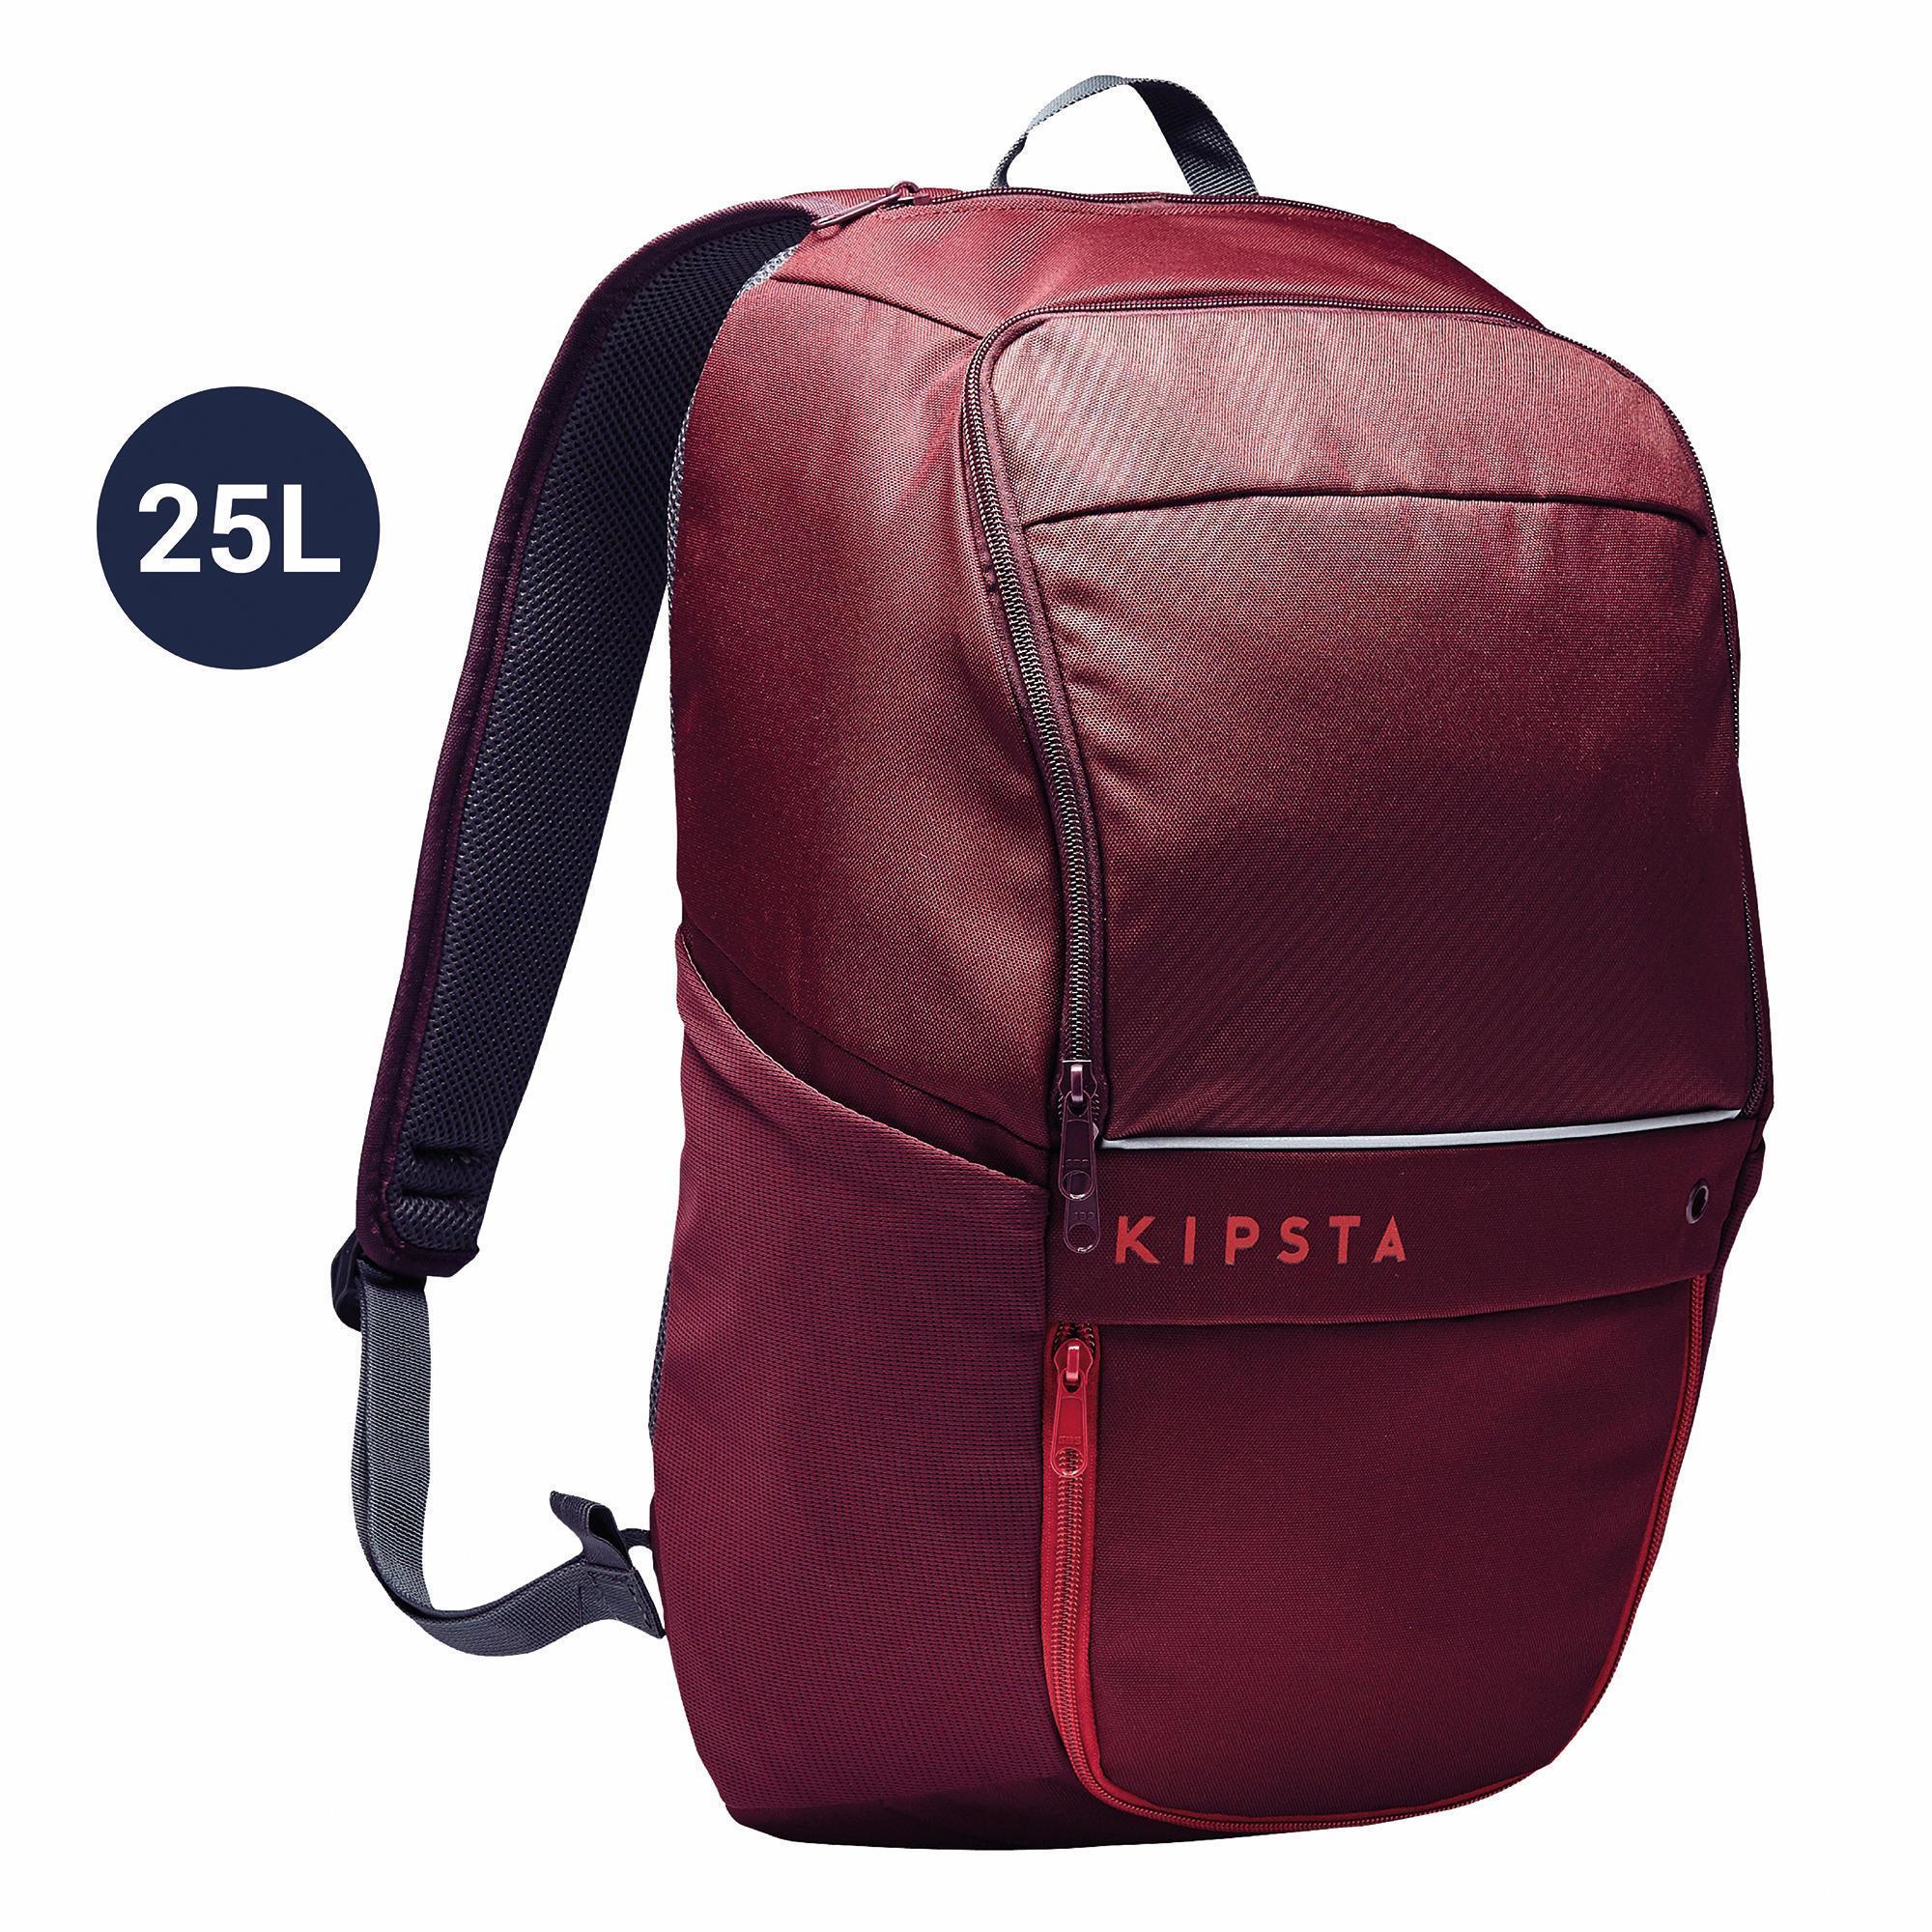 Kipsta Rugzak Classic 25 liter rood